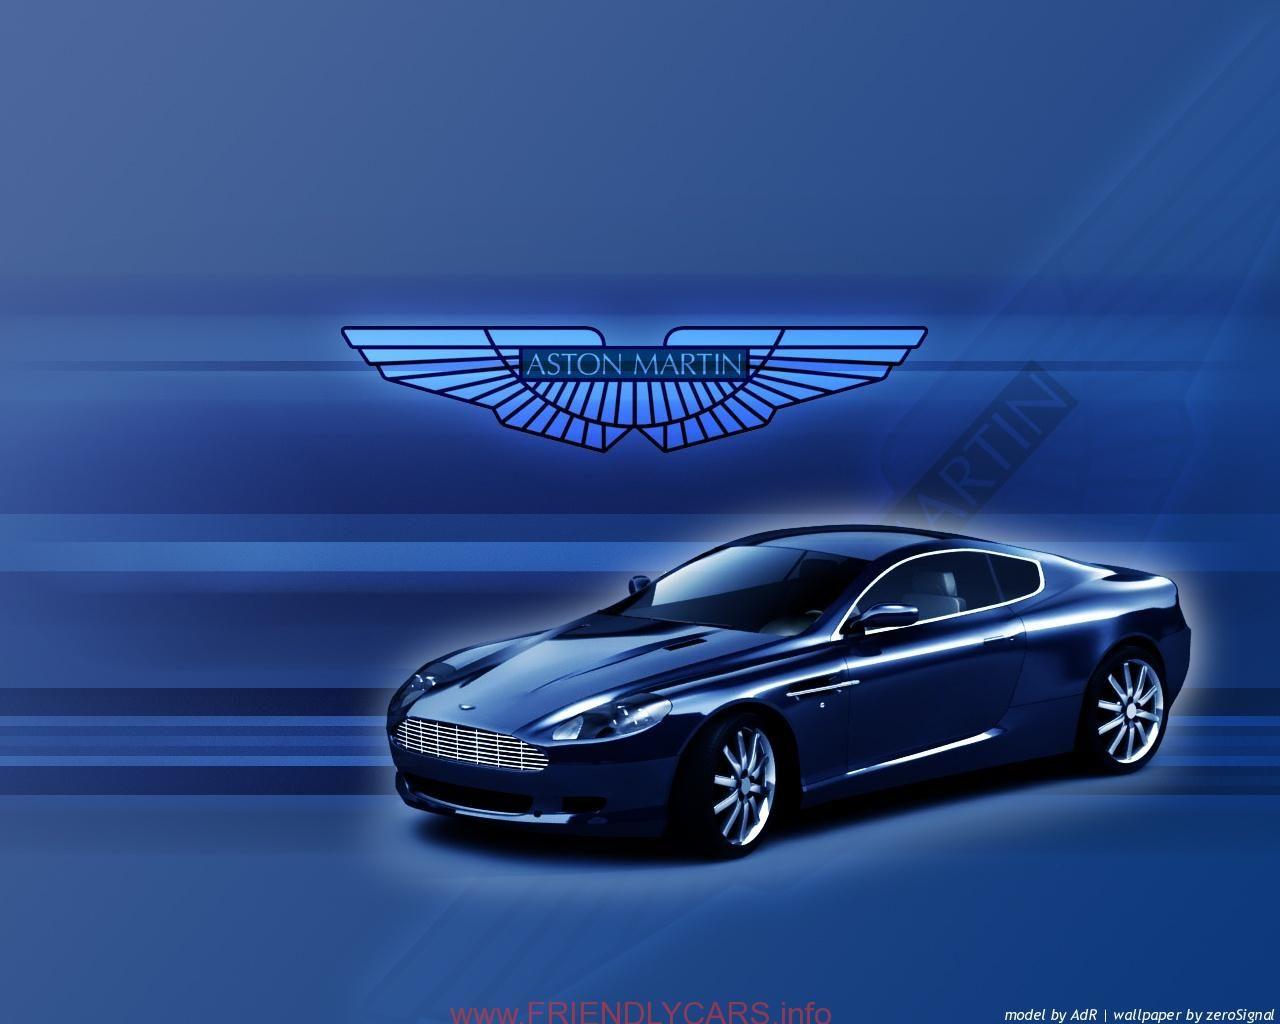 Cool Aston Martin Logo Black Background Image Hd Free Aston Martin